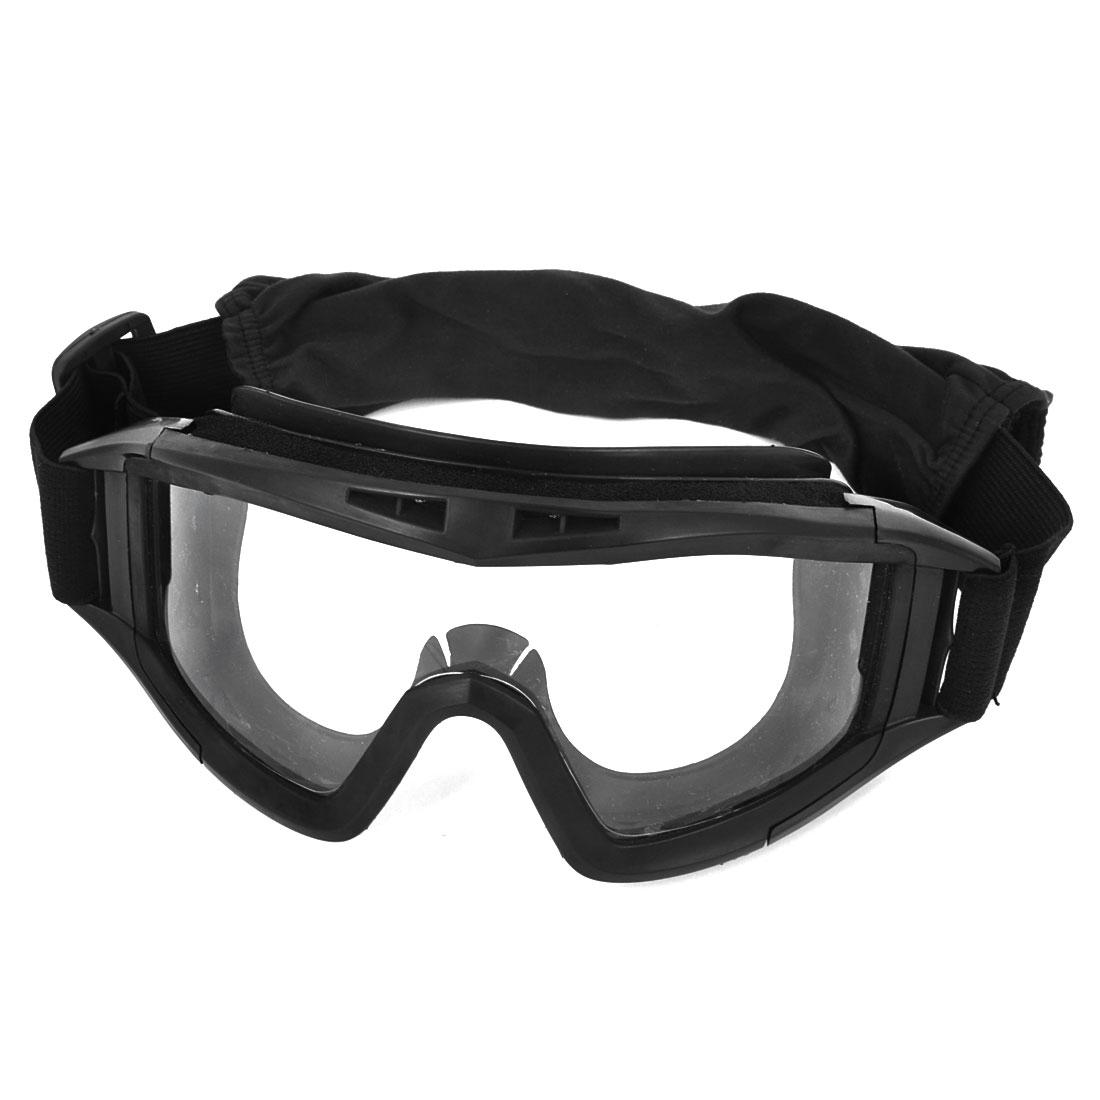 Black Winter Cycling Padded Glasses Anti Fog Ski Goggles Sunglasses